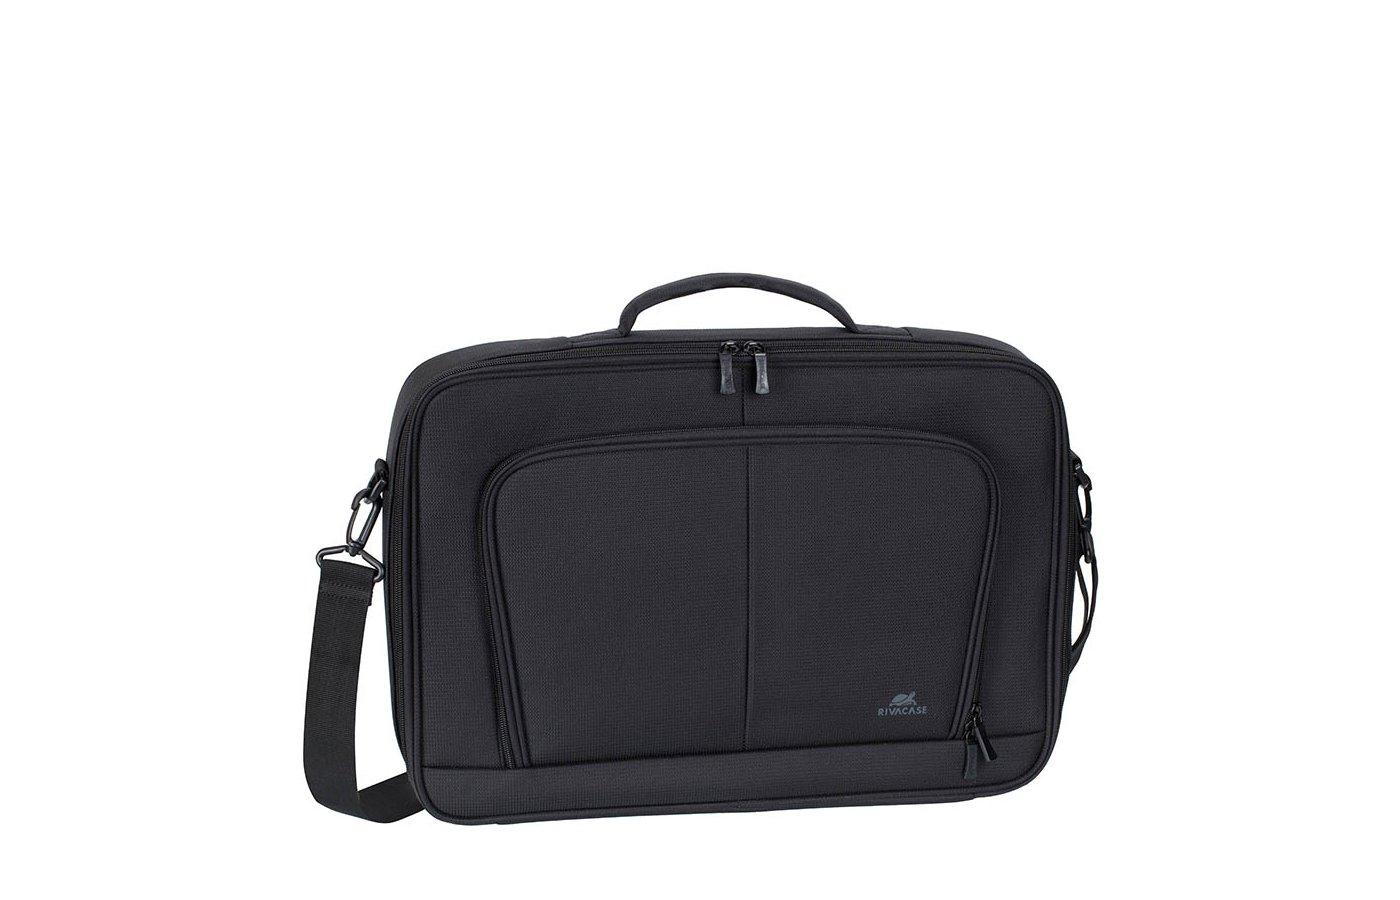 6216936ad131 Кейс для ноутбука RivaCase 8451 black для ноутбука 17.3 - купить ...